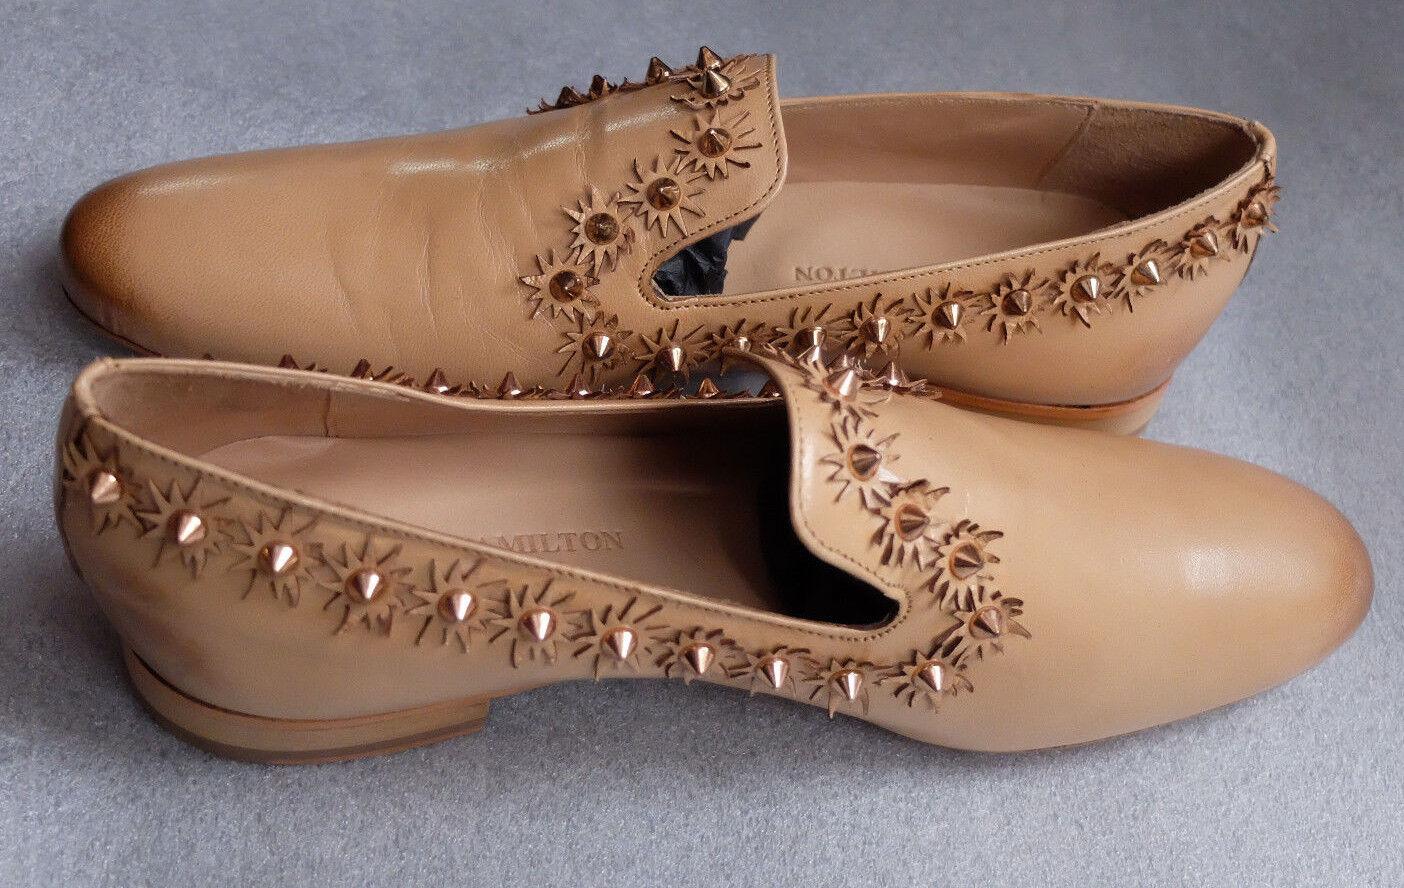 Melvin & Hamilton women's shoes size 6UK (39EU)